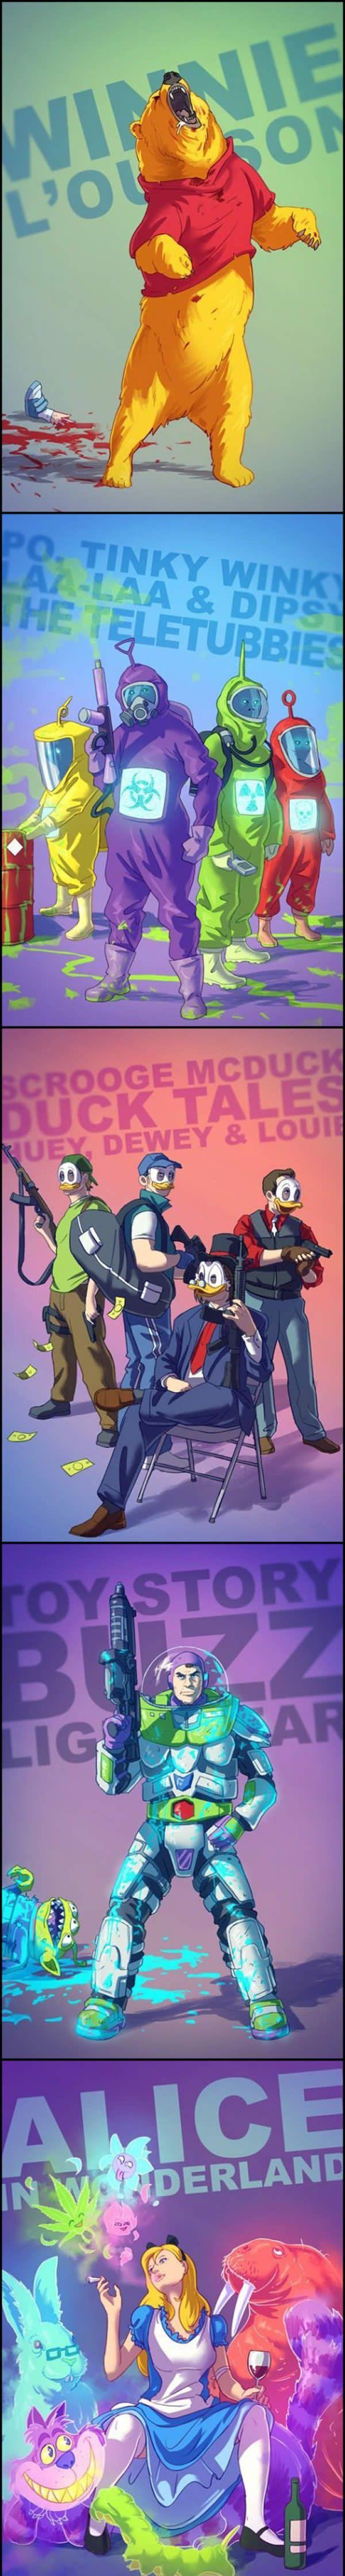 Reimagined cartoons - Adeus infância Ç-Ç #cartoons #disney | In a creepy adult world | Winnie The poo, The teletubbies, Duck Tales, Toy story - buzz, Alice in wonderland